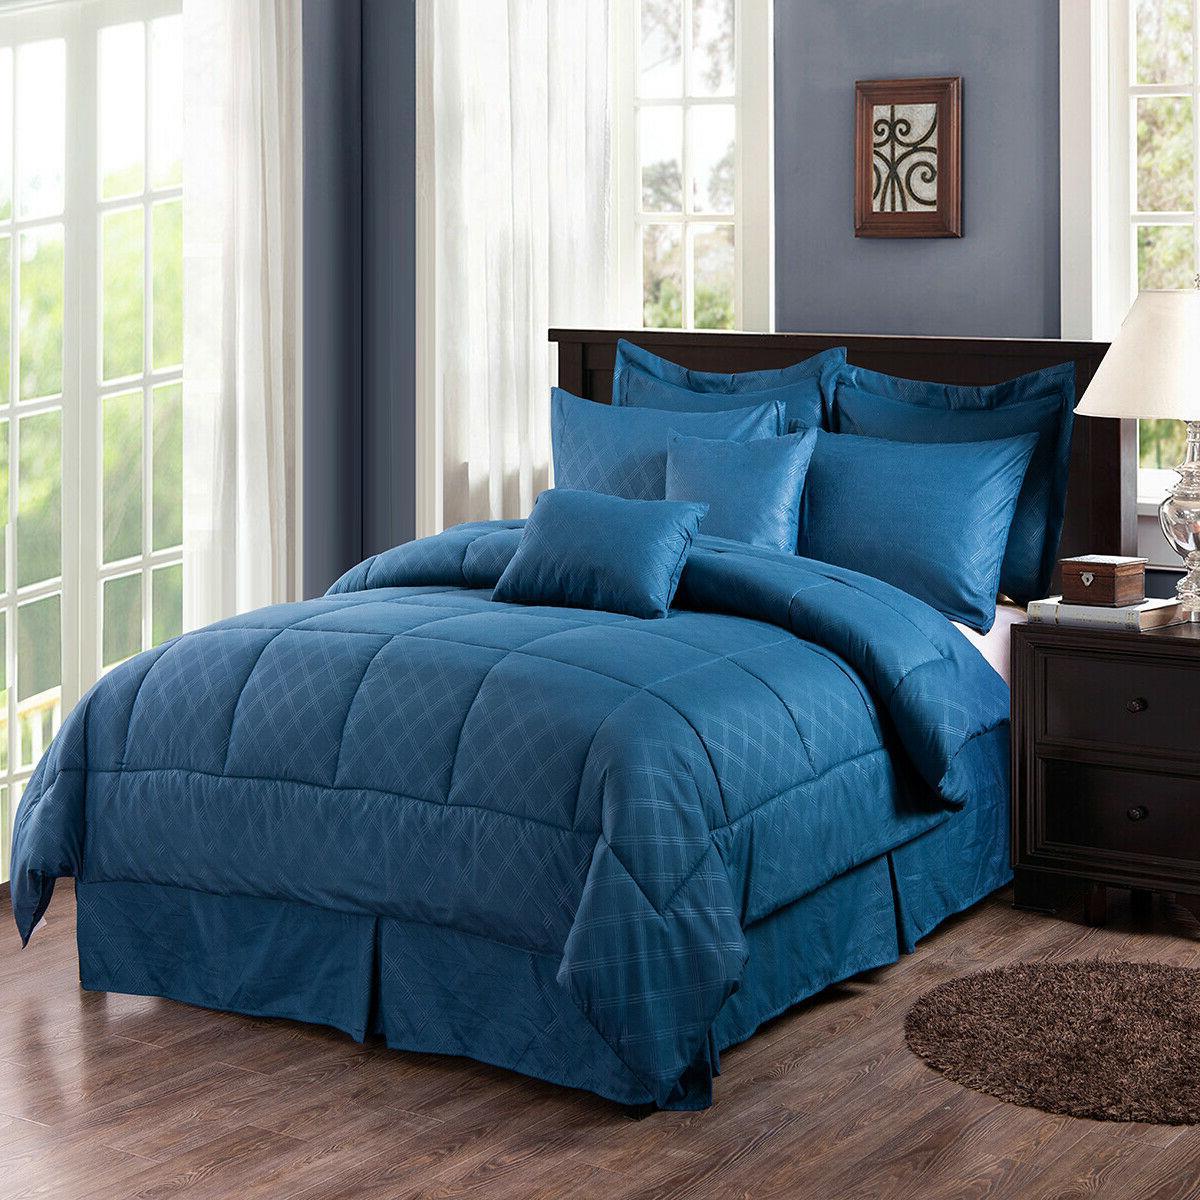 10-Piece Comforter Set Reversible Bedding + Bed King/Cal King